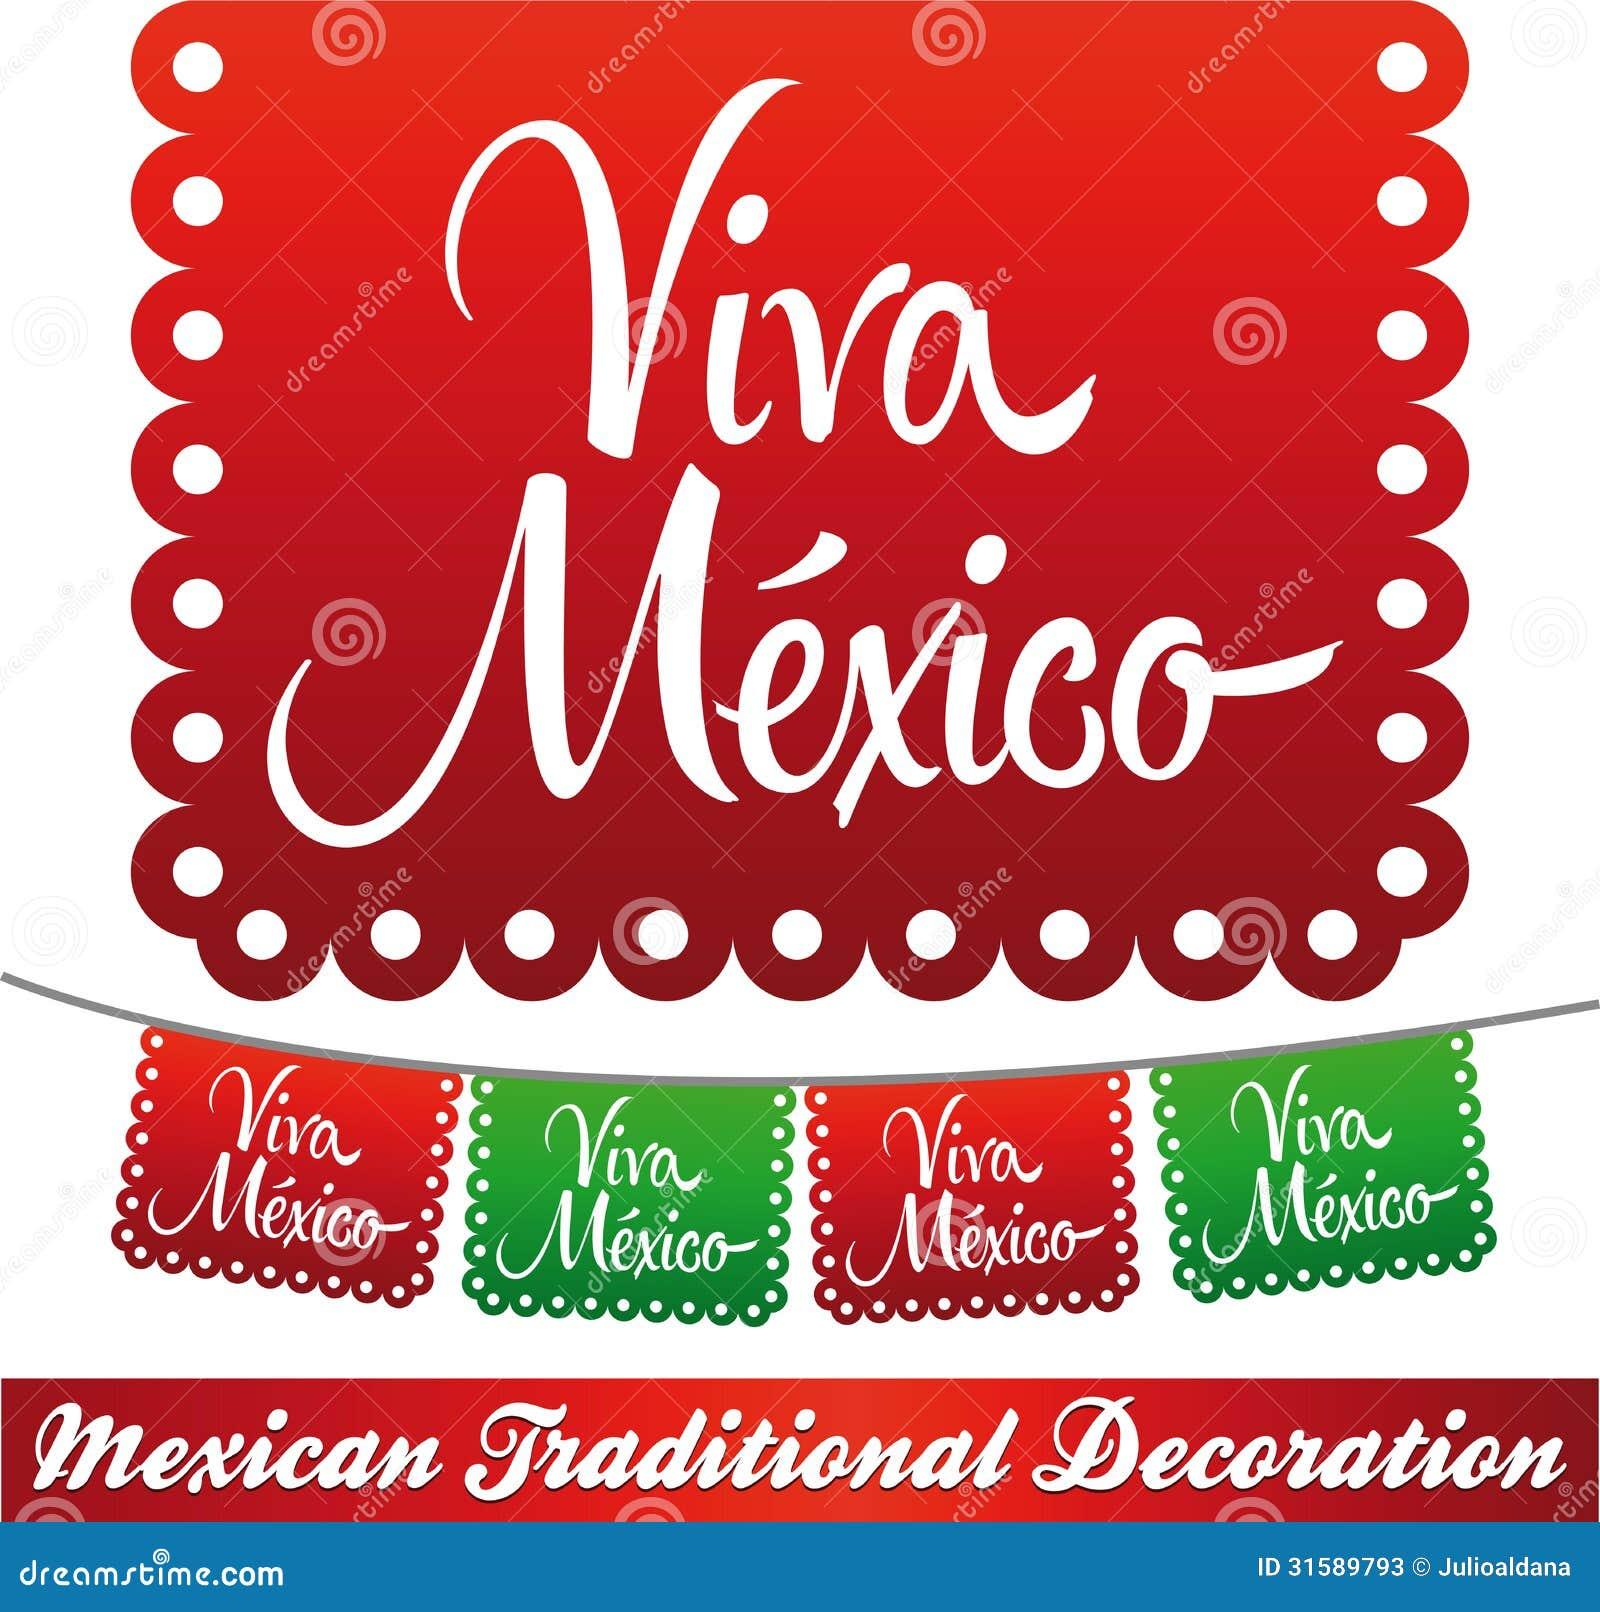 Viva Mexico Mexican Holiday Vector Decoration Stock